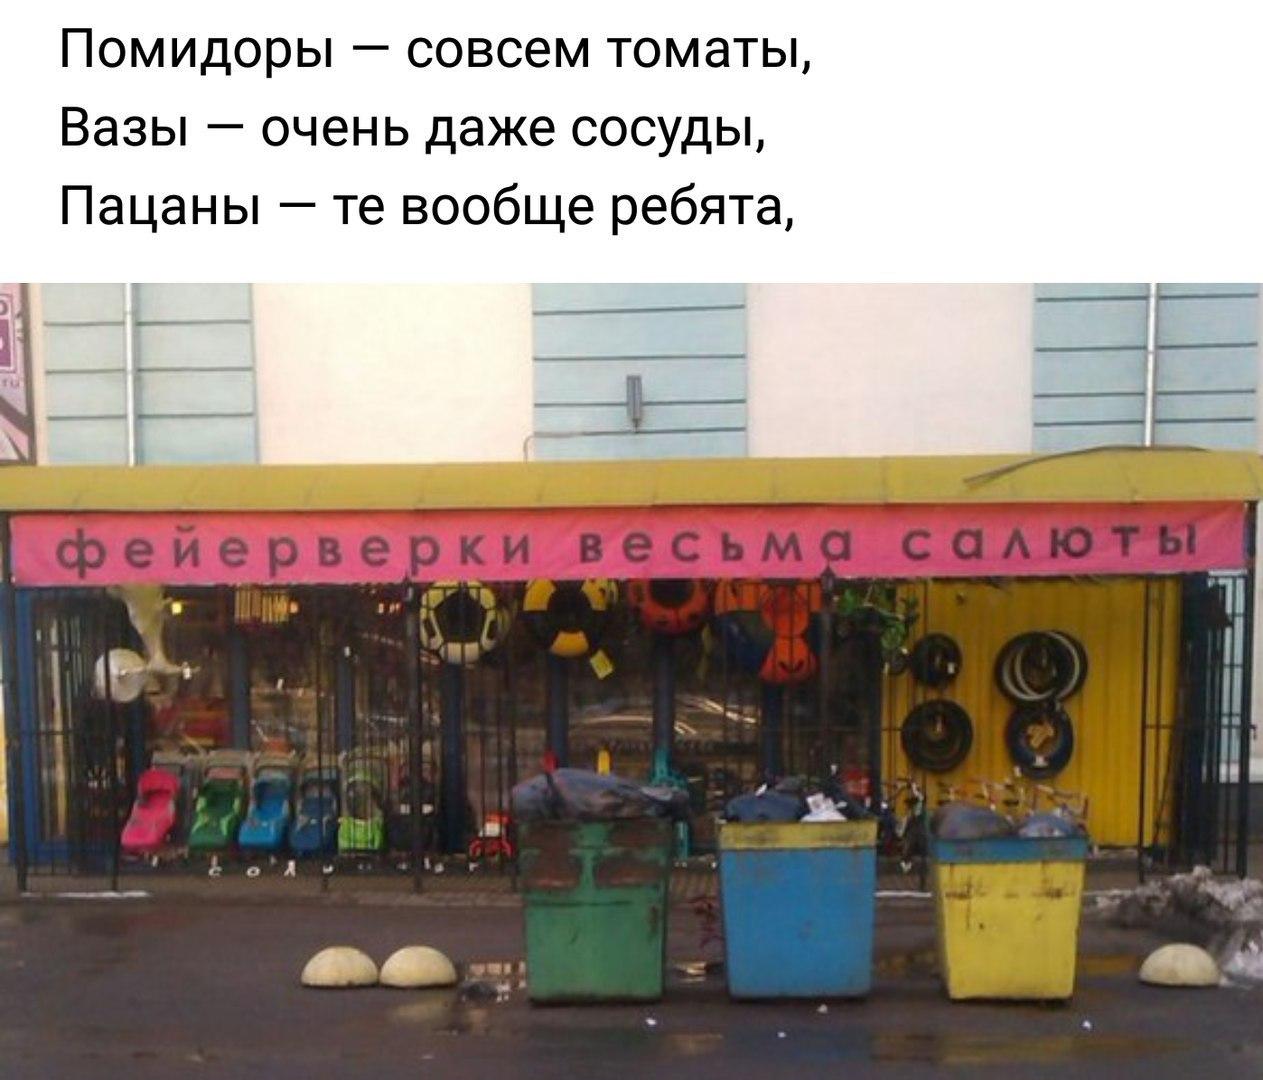 https://pp.userapi.com/c841620/v841620067/76eb4/XWTcguzjx5Q.jpg